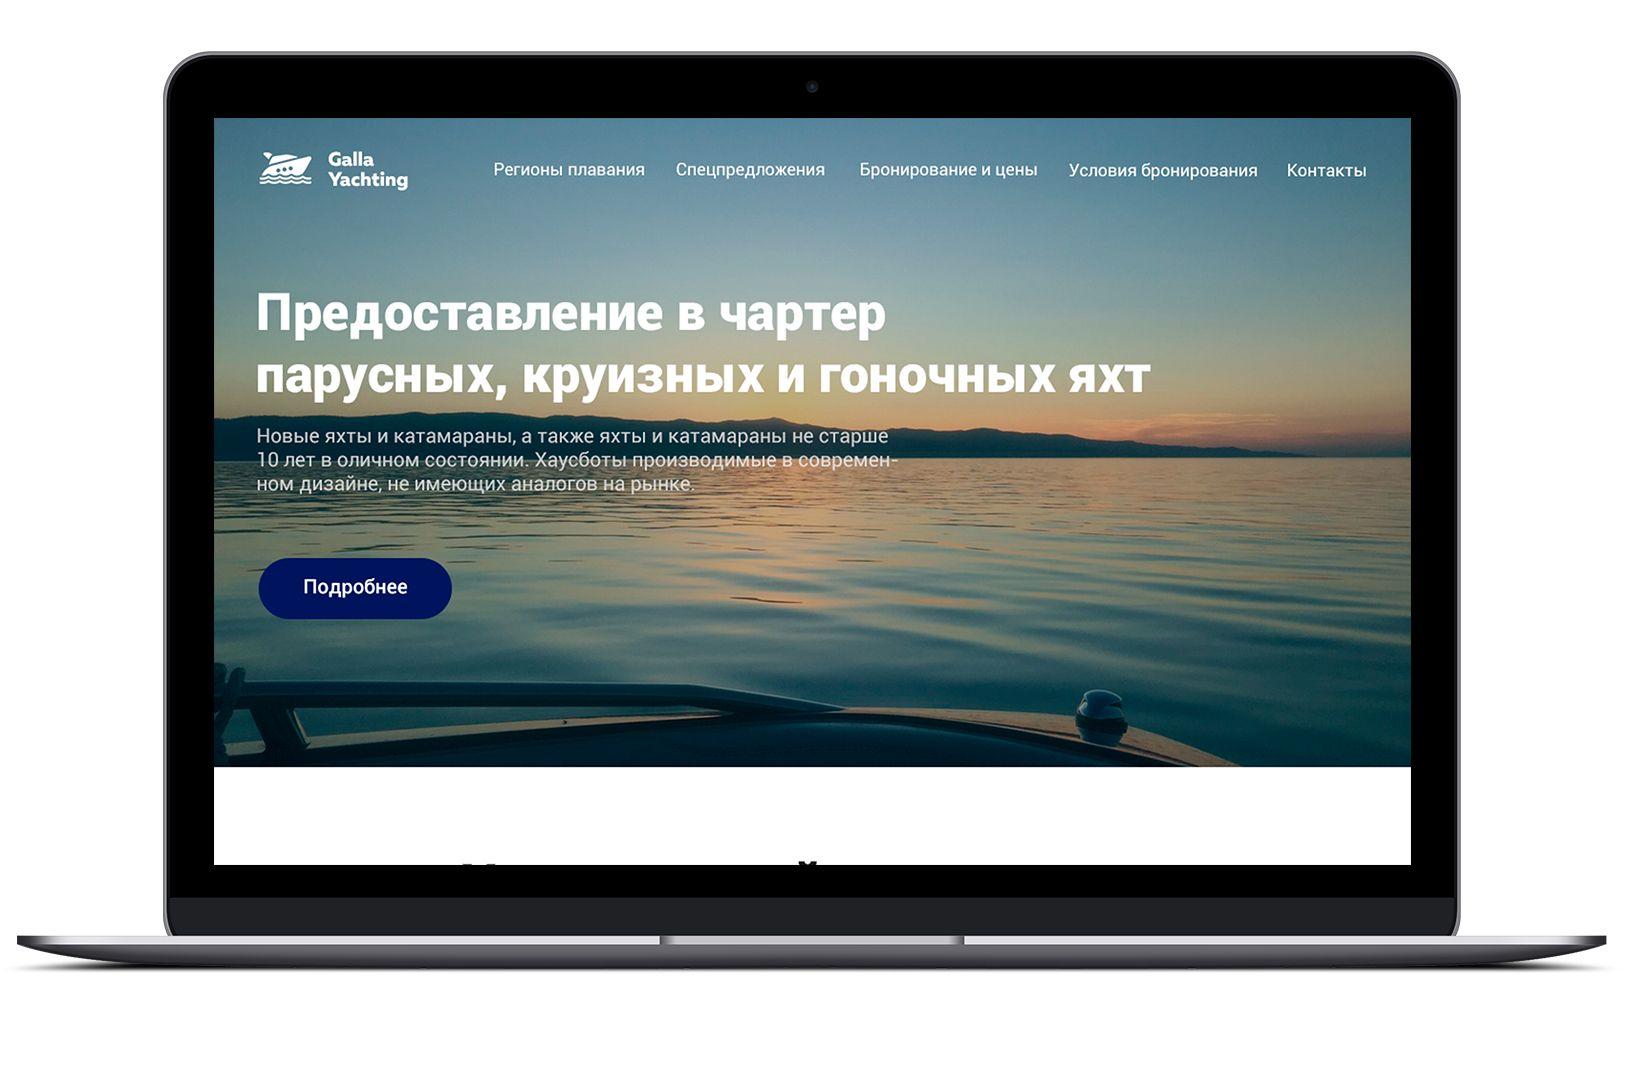 Веб-сайт для gallayachting.com - дизайнер borisshchekin